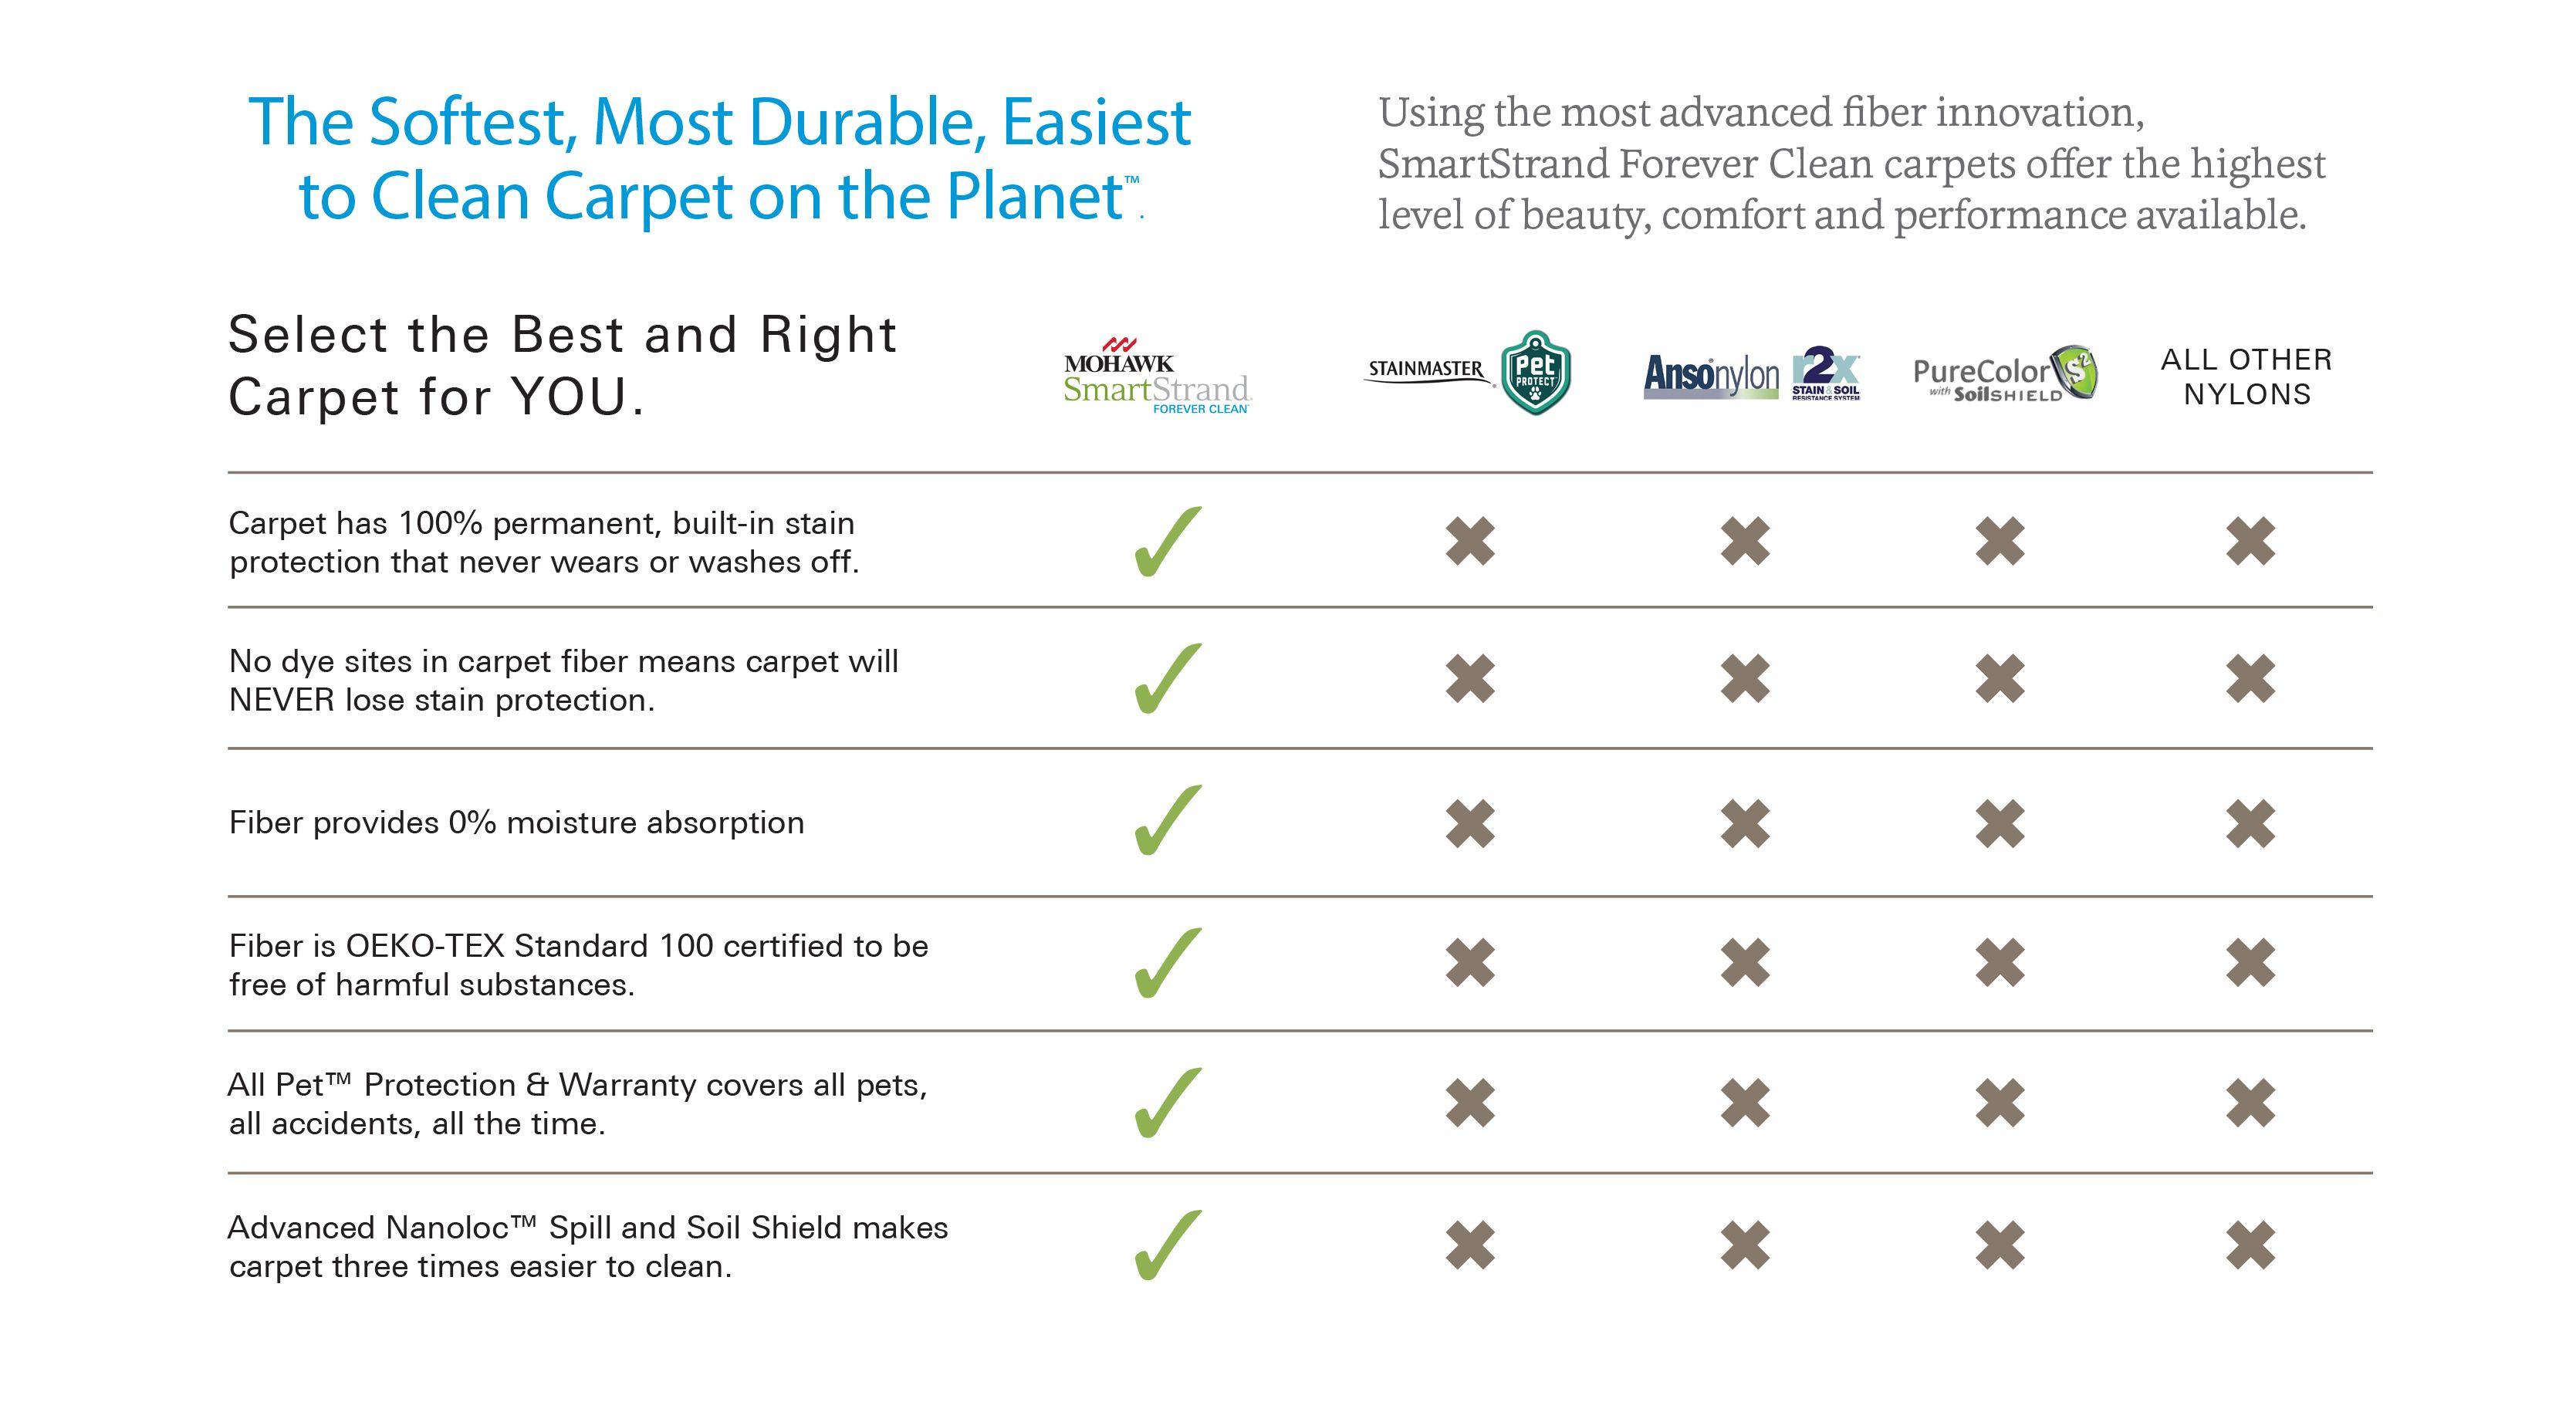 SmartStrand Stain Resistant Carpet, Stain Proof Carpet & Carpets